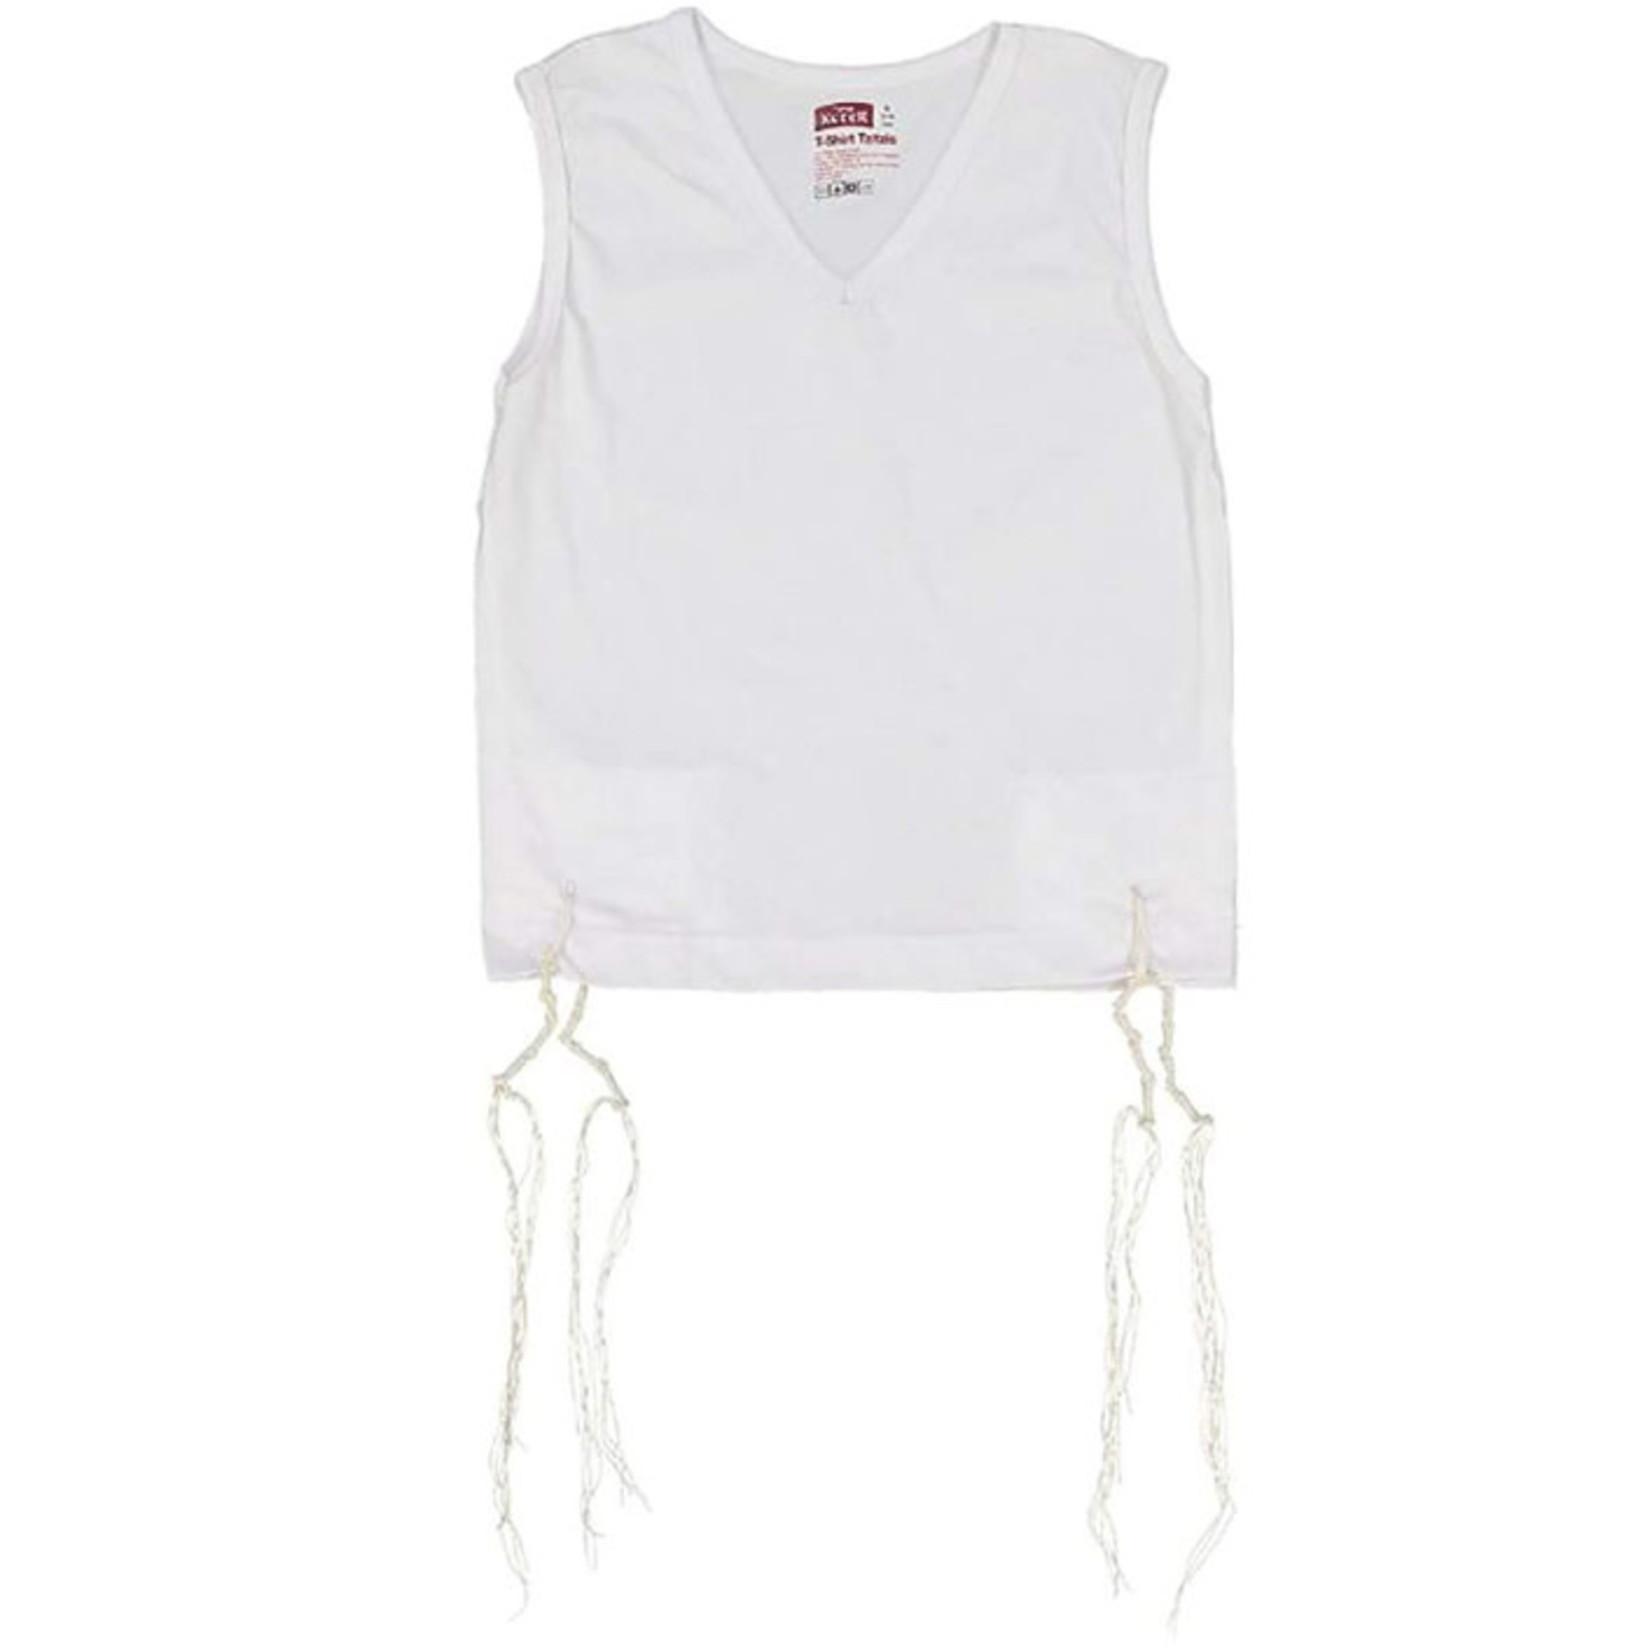 Undershirt-Style Arbah Kanfot, 100% Cotton, V-Neck, Size 6